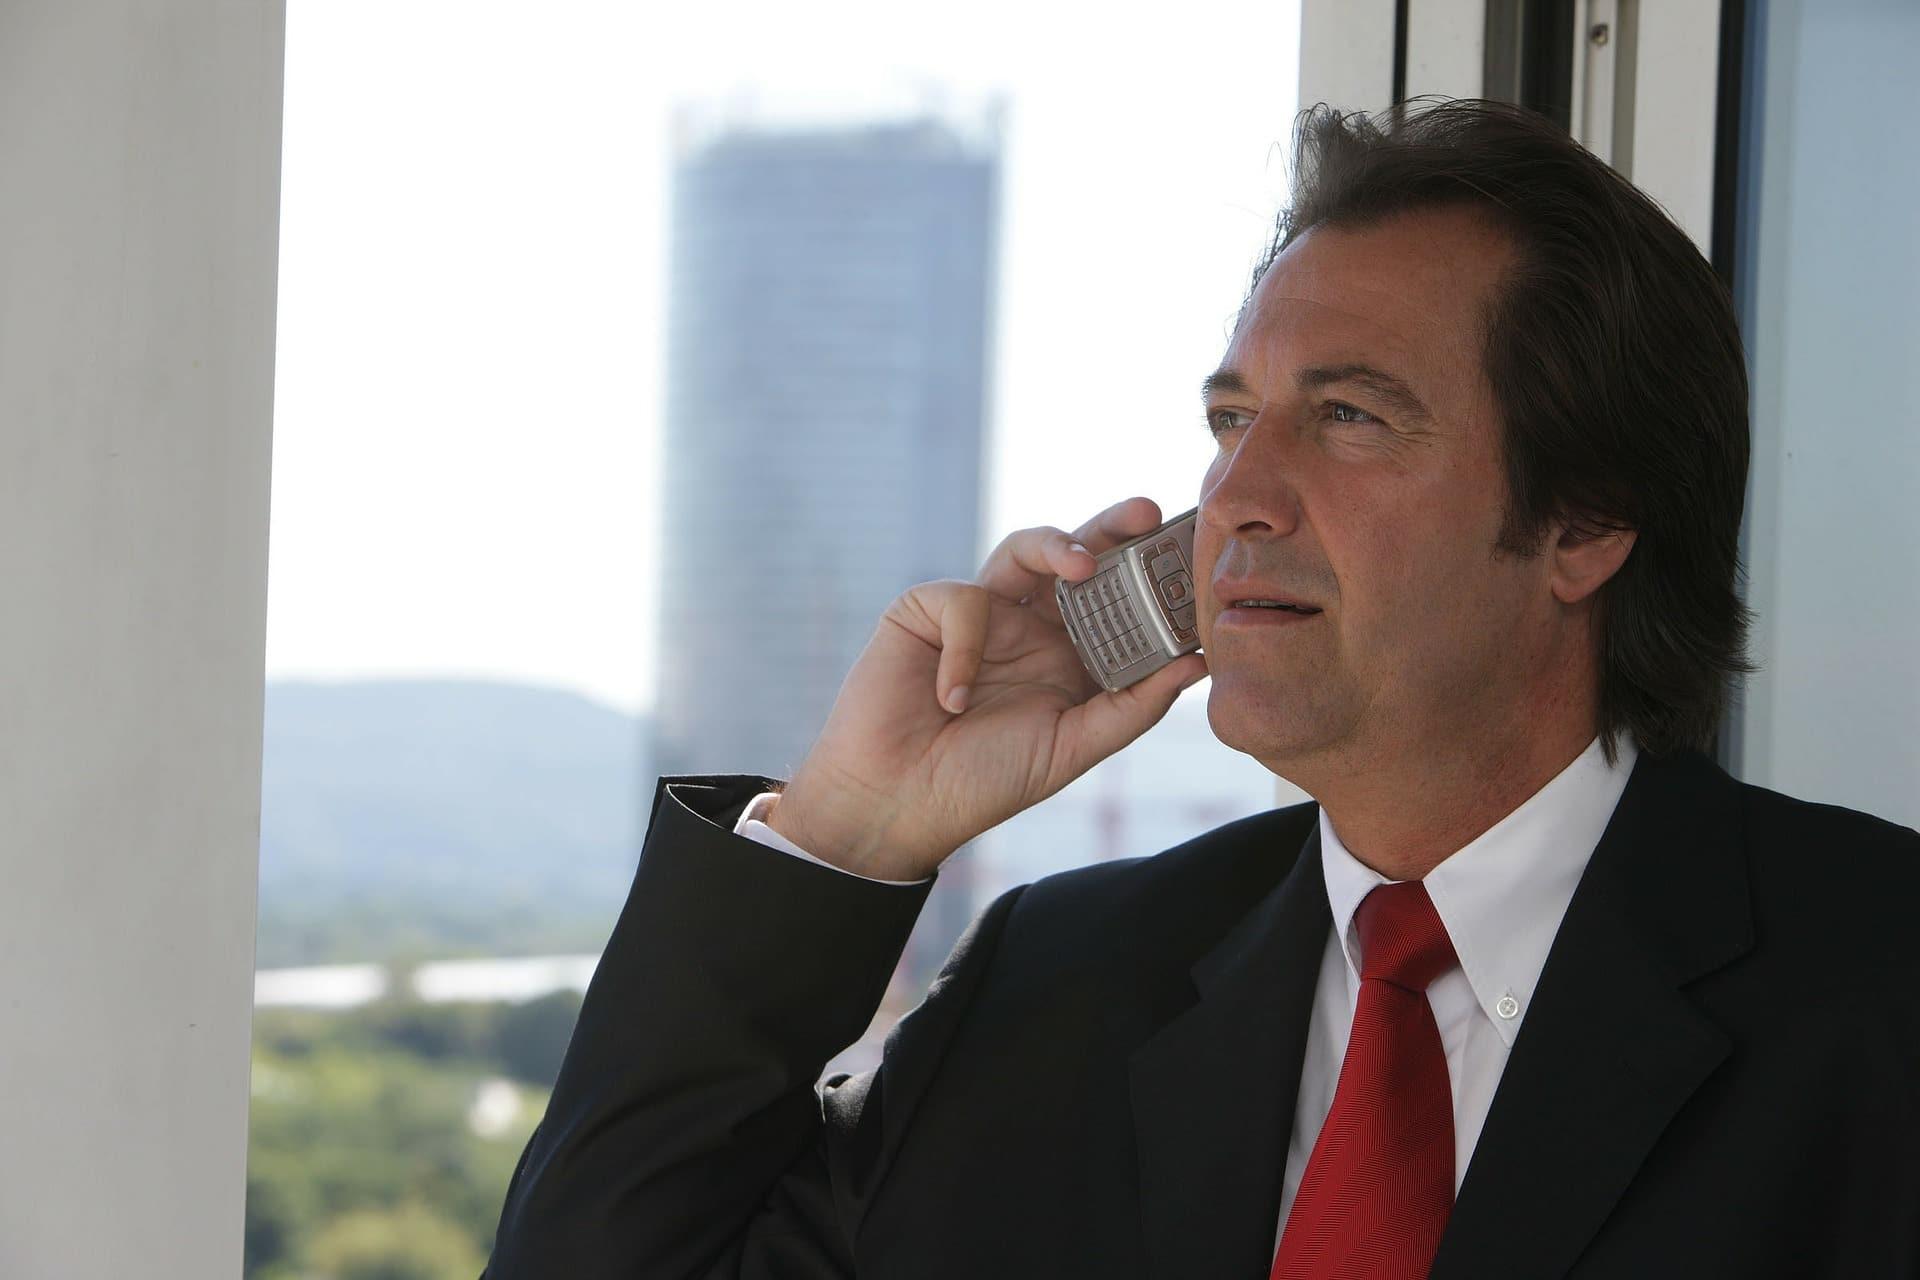 mortgage broker for business